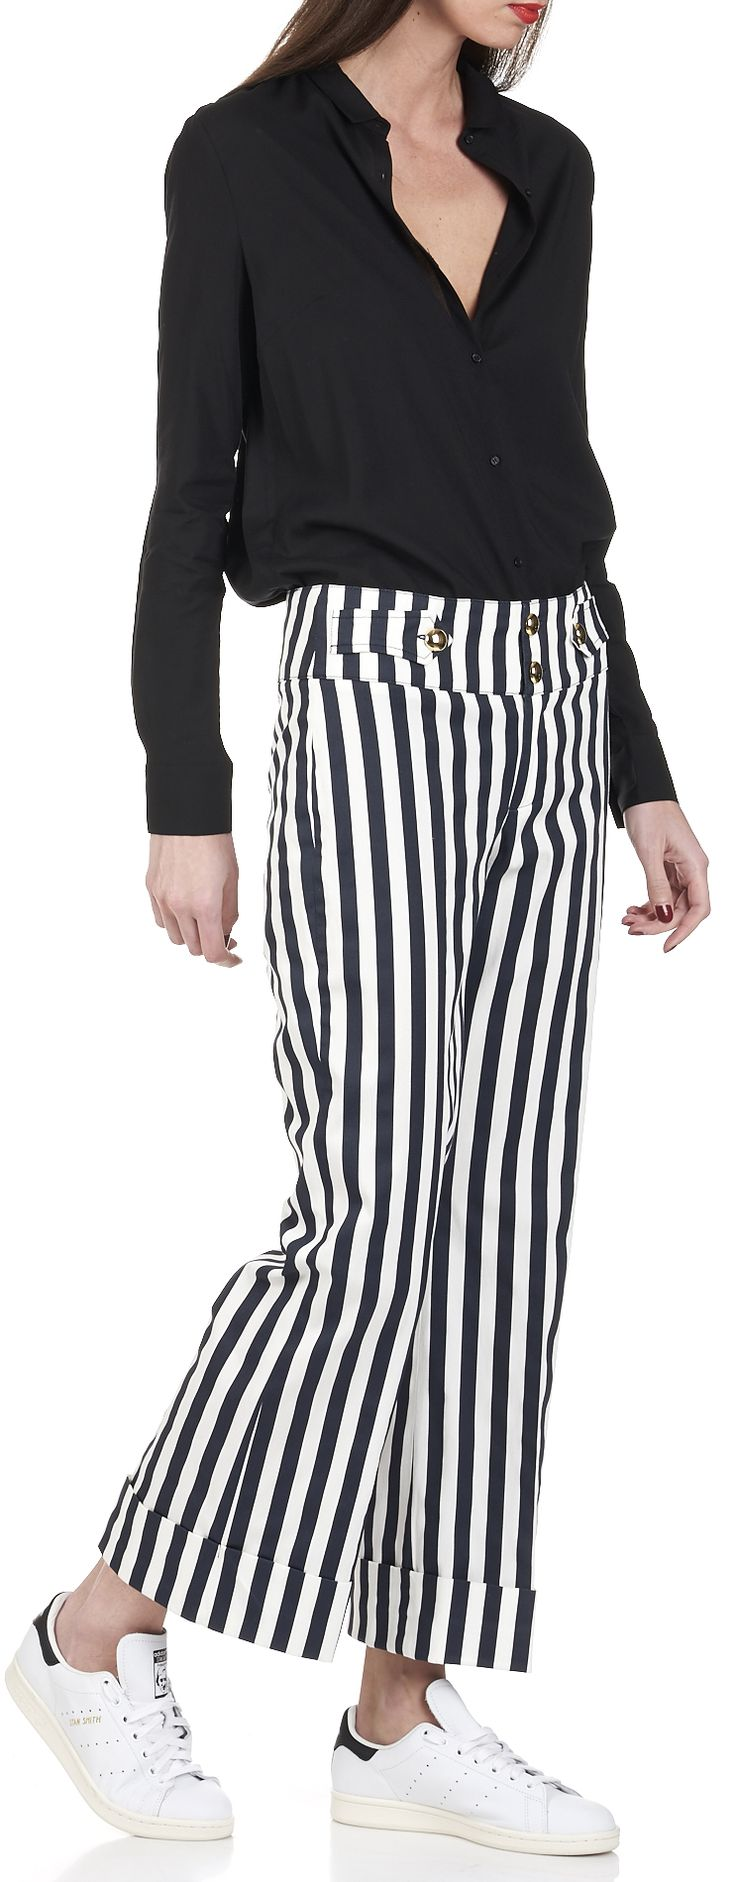 Pantalon ray bleu blanc femme hi06 jornalagora - Que porter avec un pantalon bleu marine ...